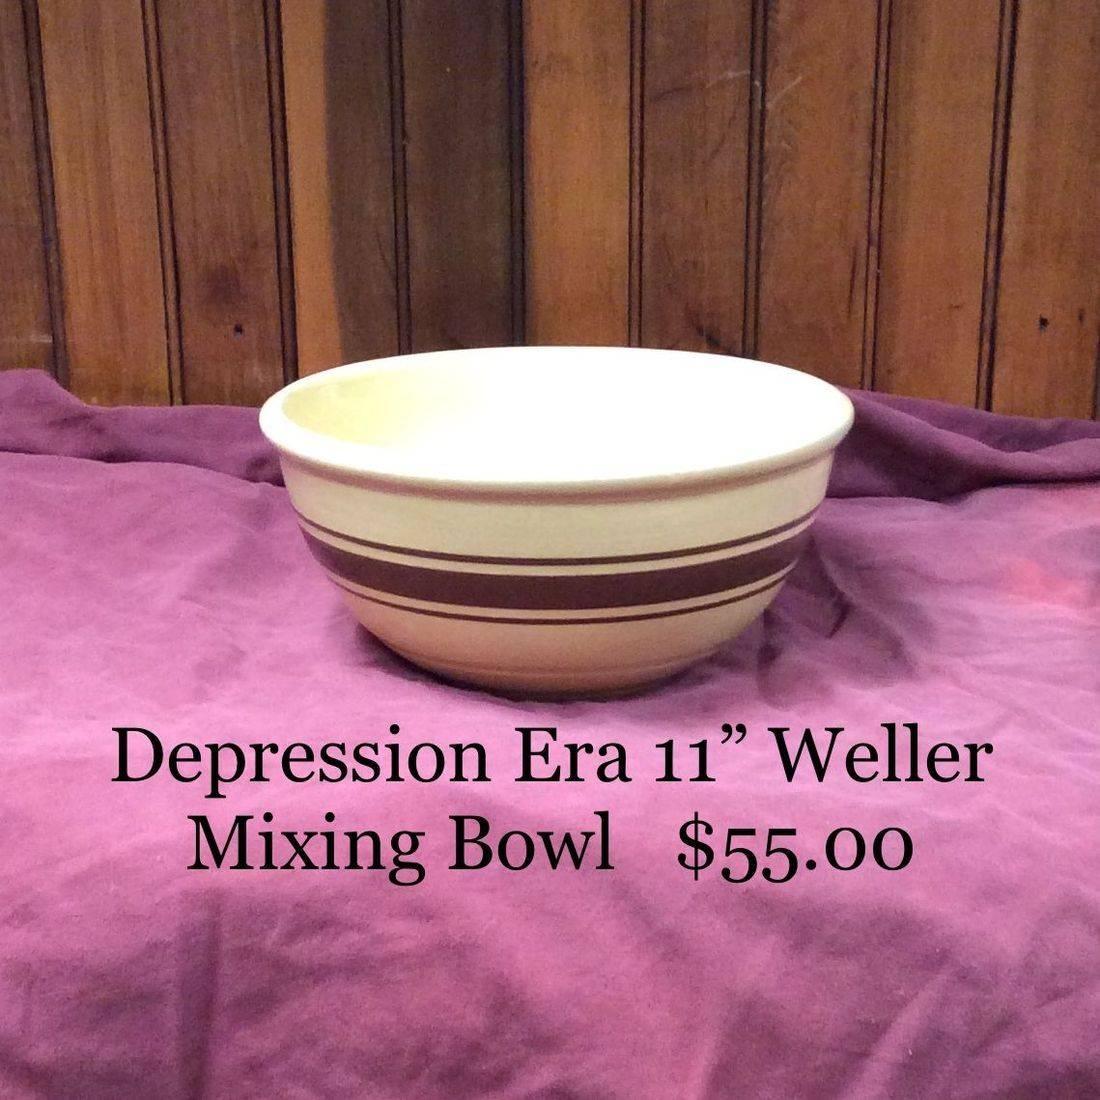 "Depression Era 11"" Weller Mixing Bowl   $55.00"